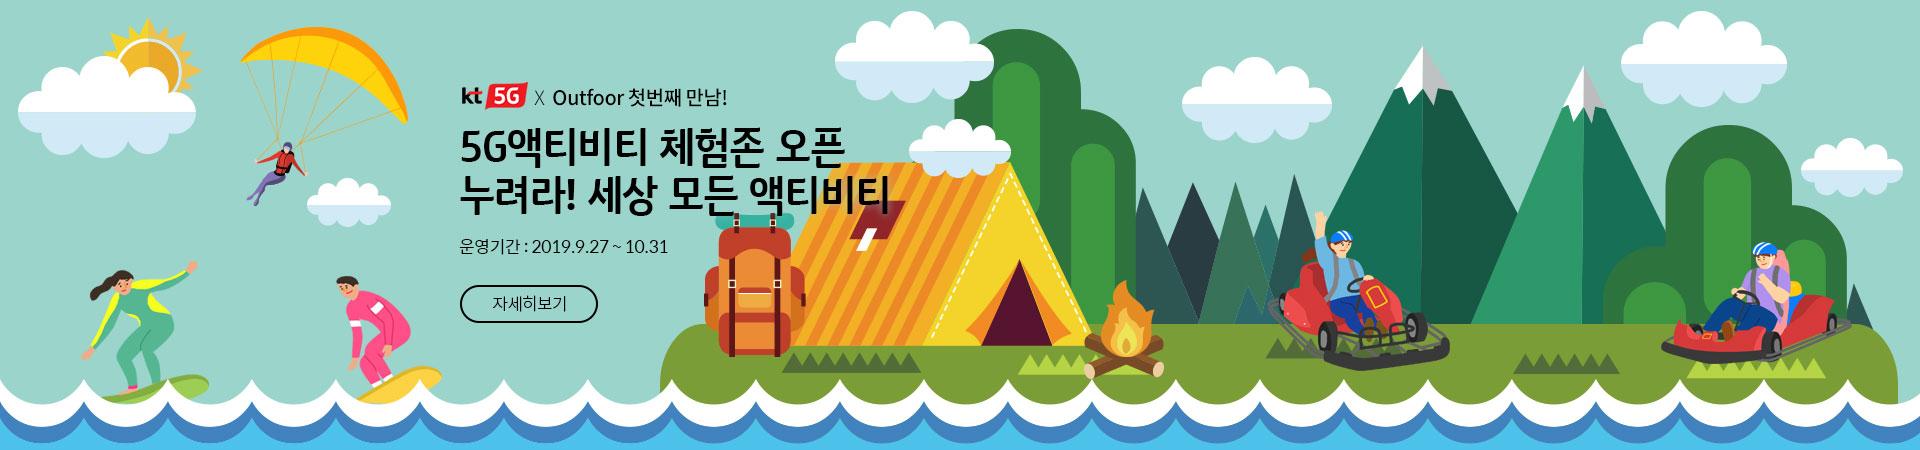 Kt 5GXOutfoor첫번째 만남! 5G액티비티 체험존오픈 누려라! 세상모든액티비티 운영기간:2019.9.27~10.31